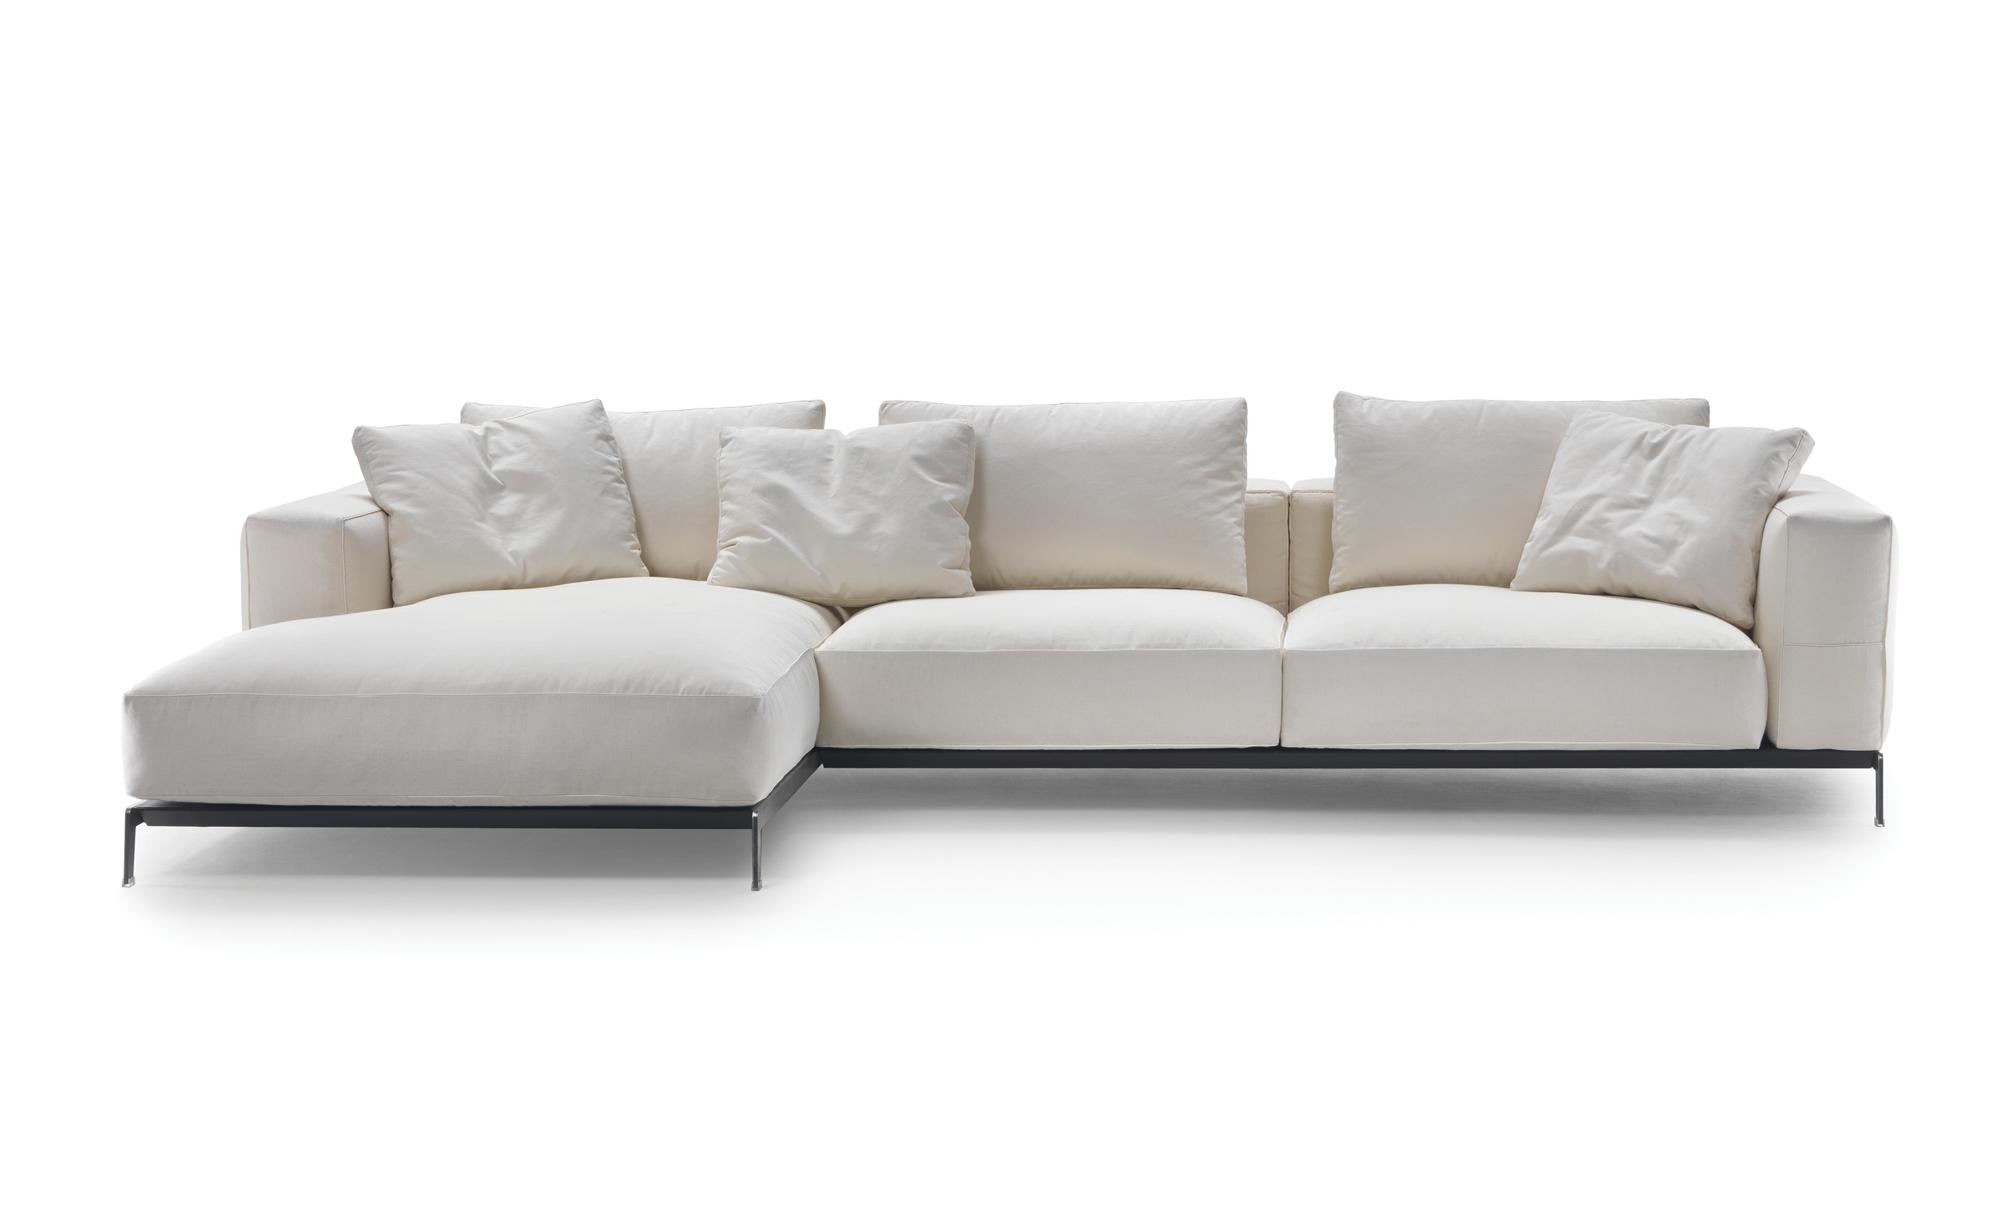 Modular Couches With Regard To Modular Sofas (View 7 of 20)